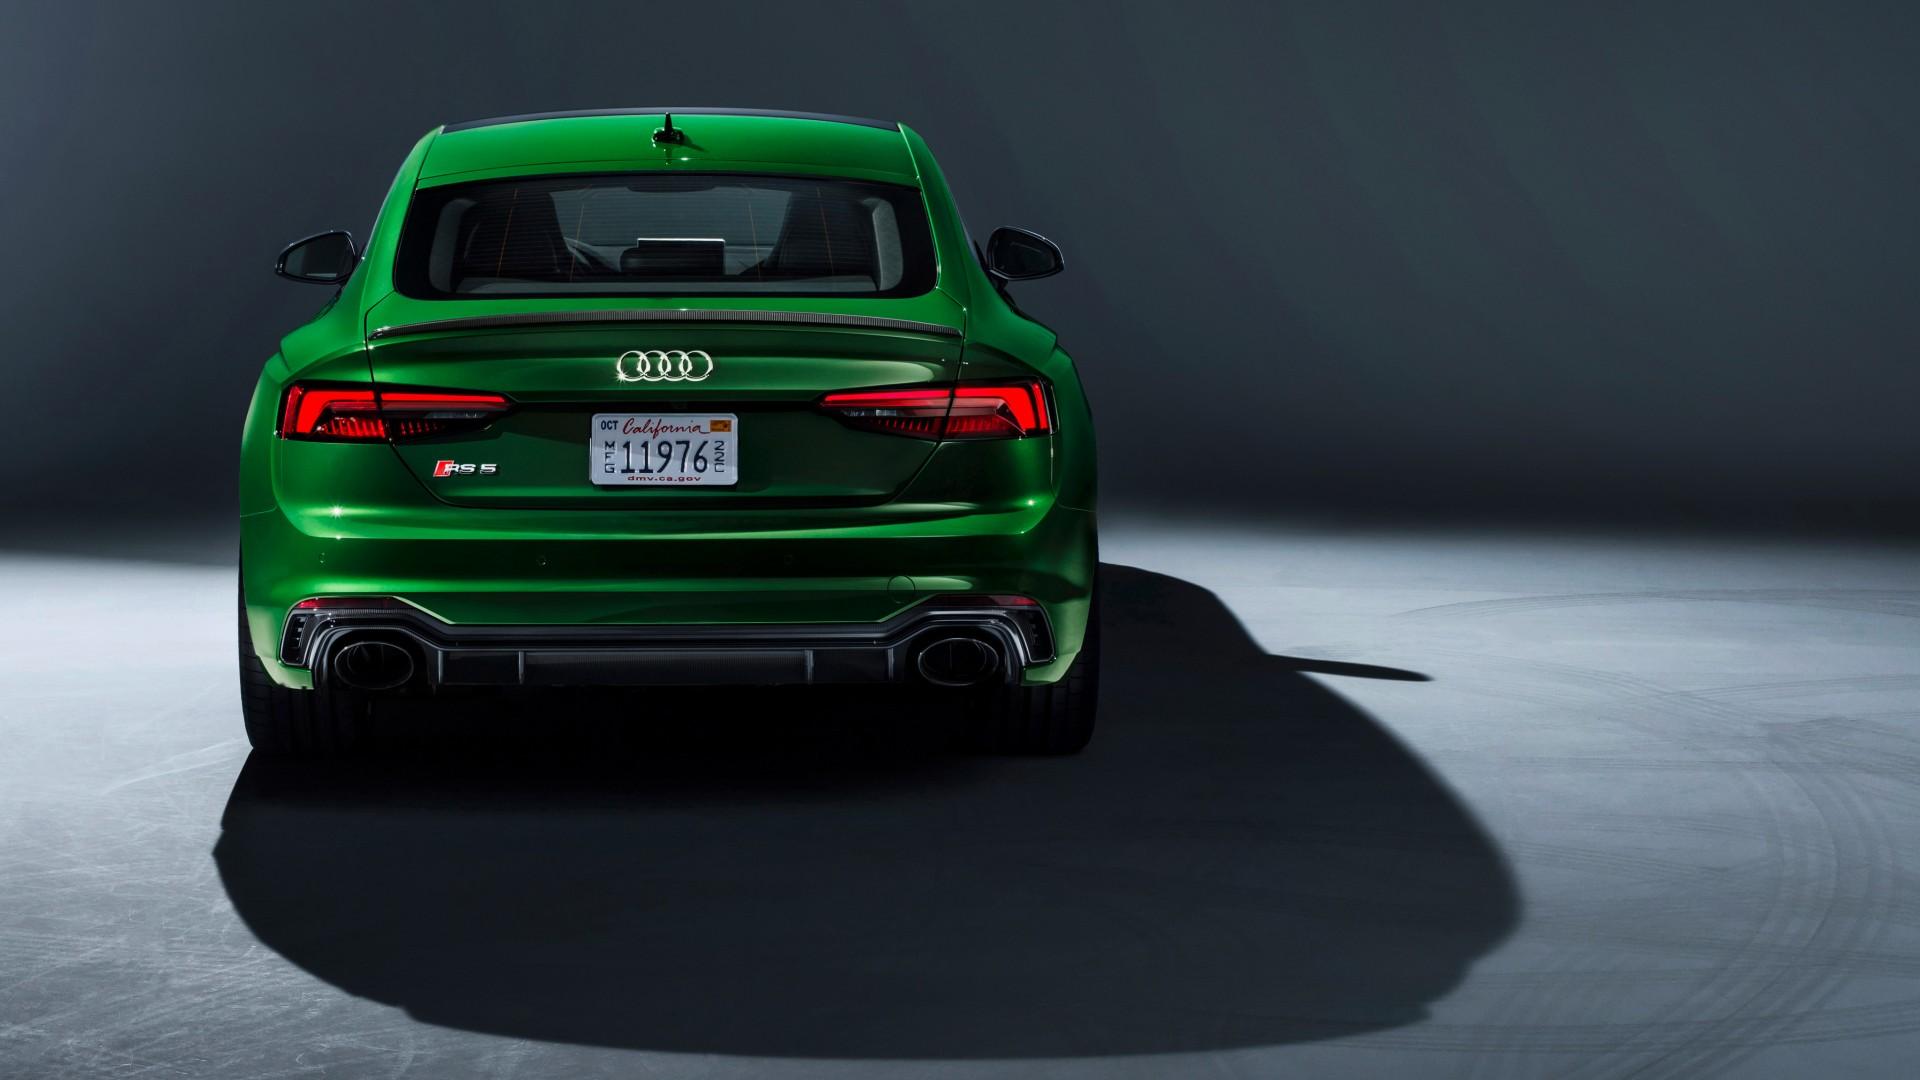 Audi Rs3 Wallpaper Hd 2019 Audi Rs 5 Sportback 4k 3 Wallpaper Hd Car